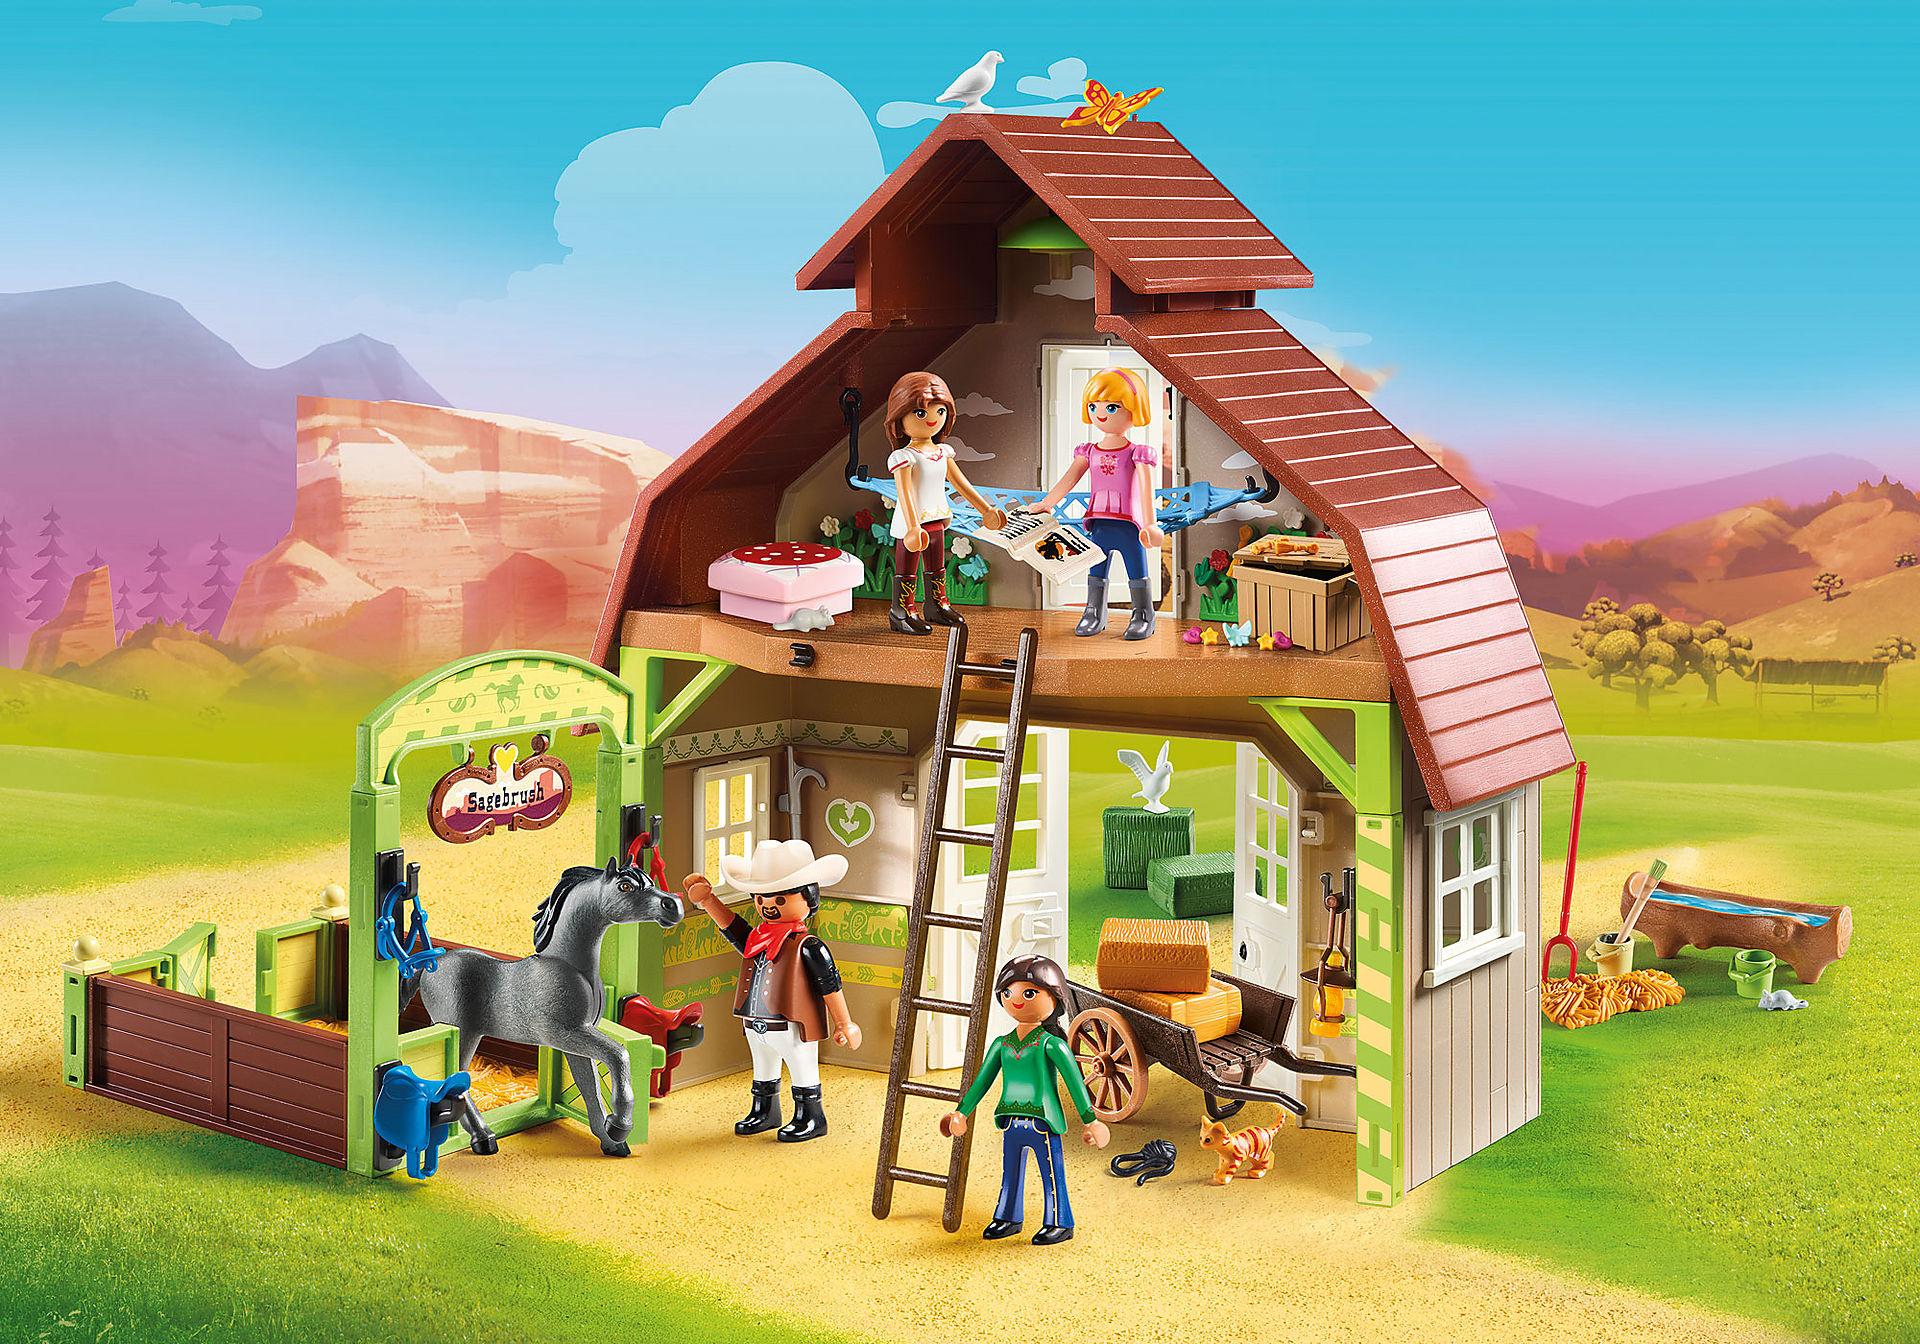 http://media.playmobil.com/i/playmobil/70118_product_detail/Aχυρώνας με τη Λάκυ, την Πρου και την Άμπιγκεϊλ